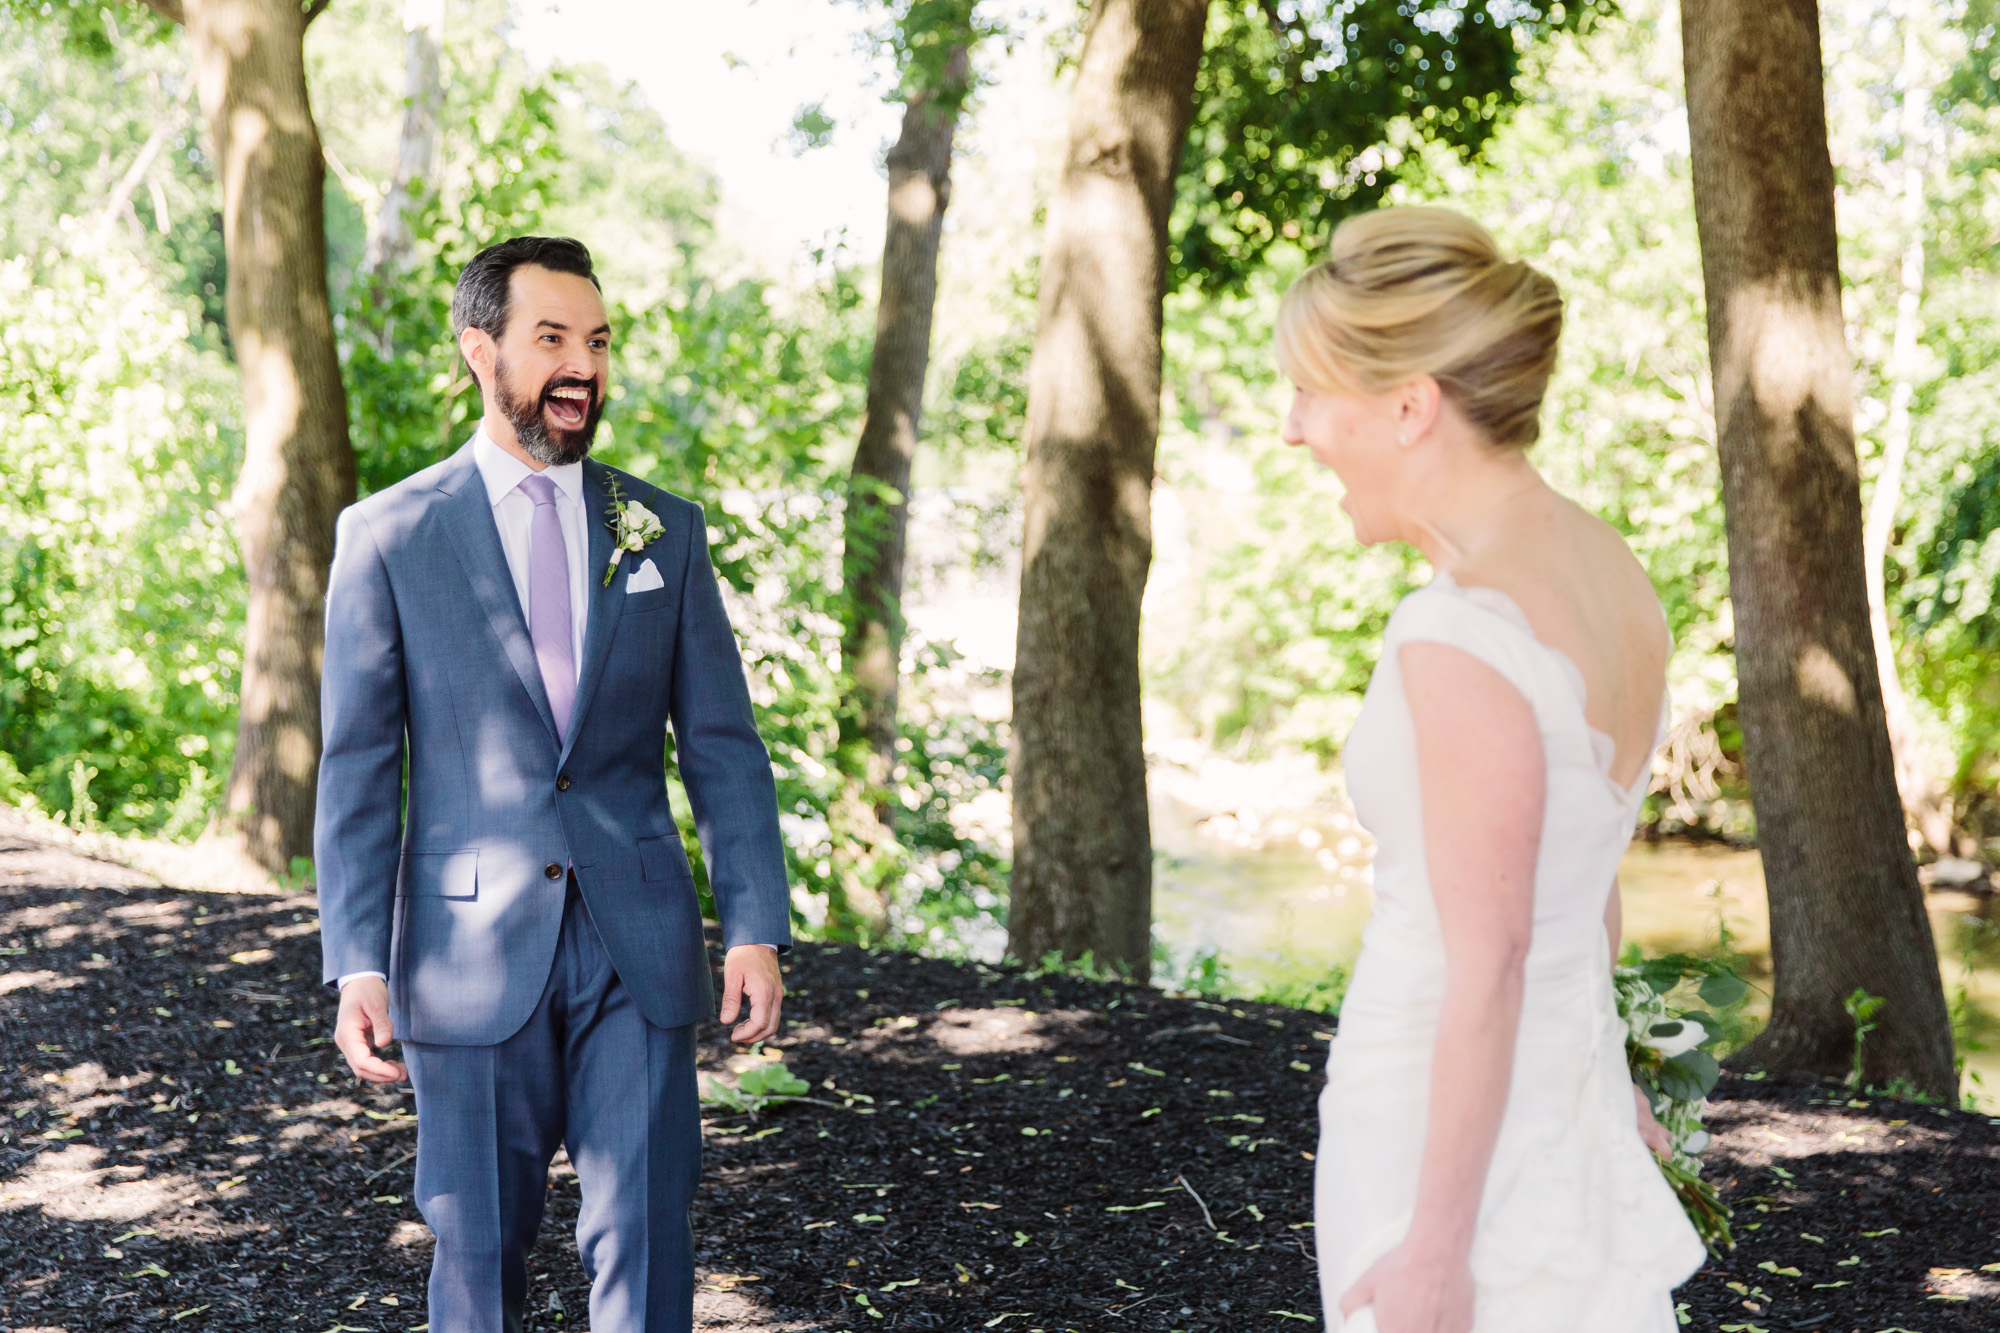 29_Rowan_Brian_The_Roundhouse_Wedding_Beacon_NY_Tanya_Salazar_Photography_165.jpg